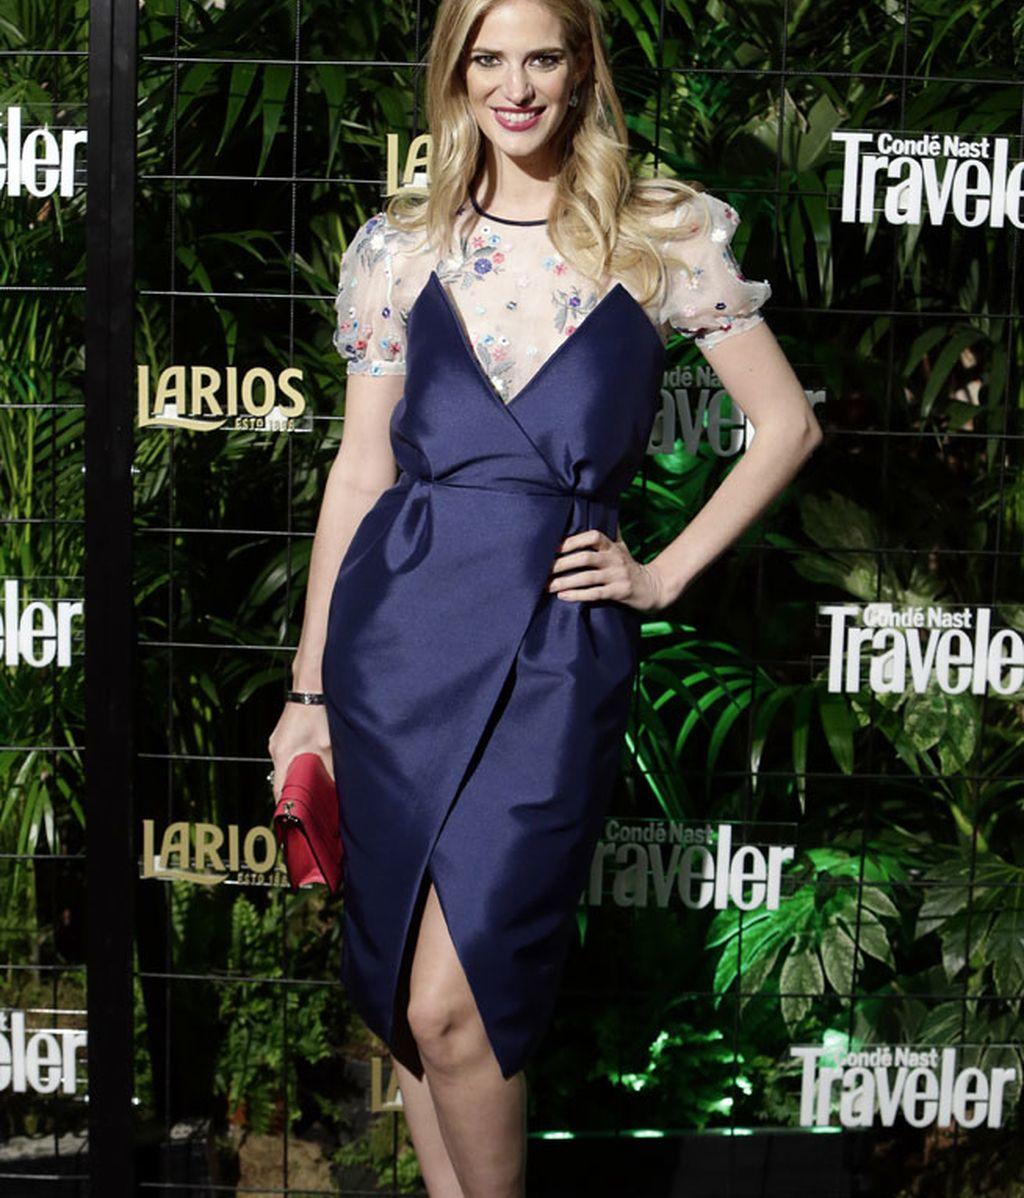 Teresa Baca con vestido azul satinado